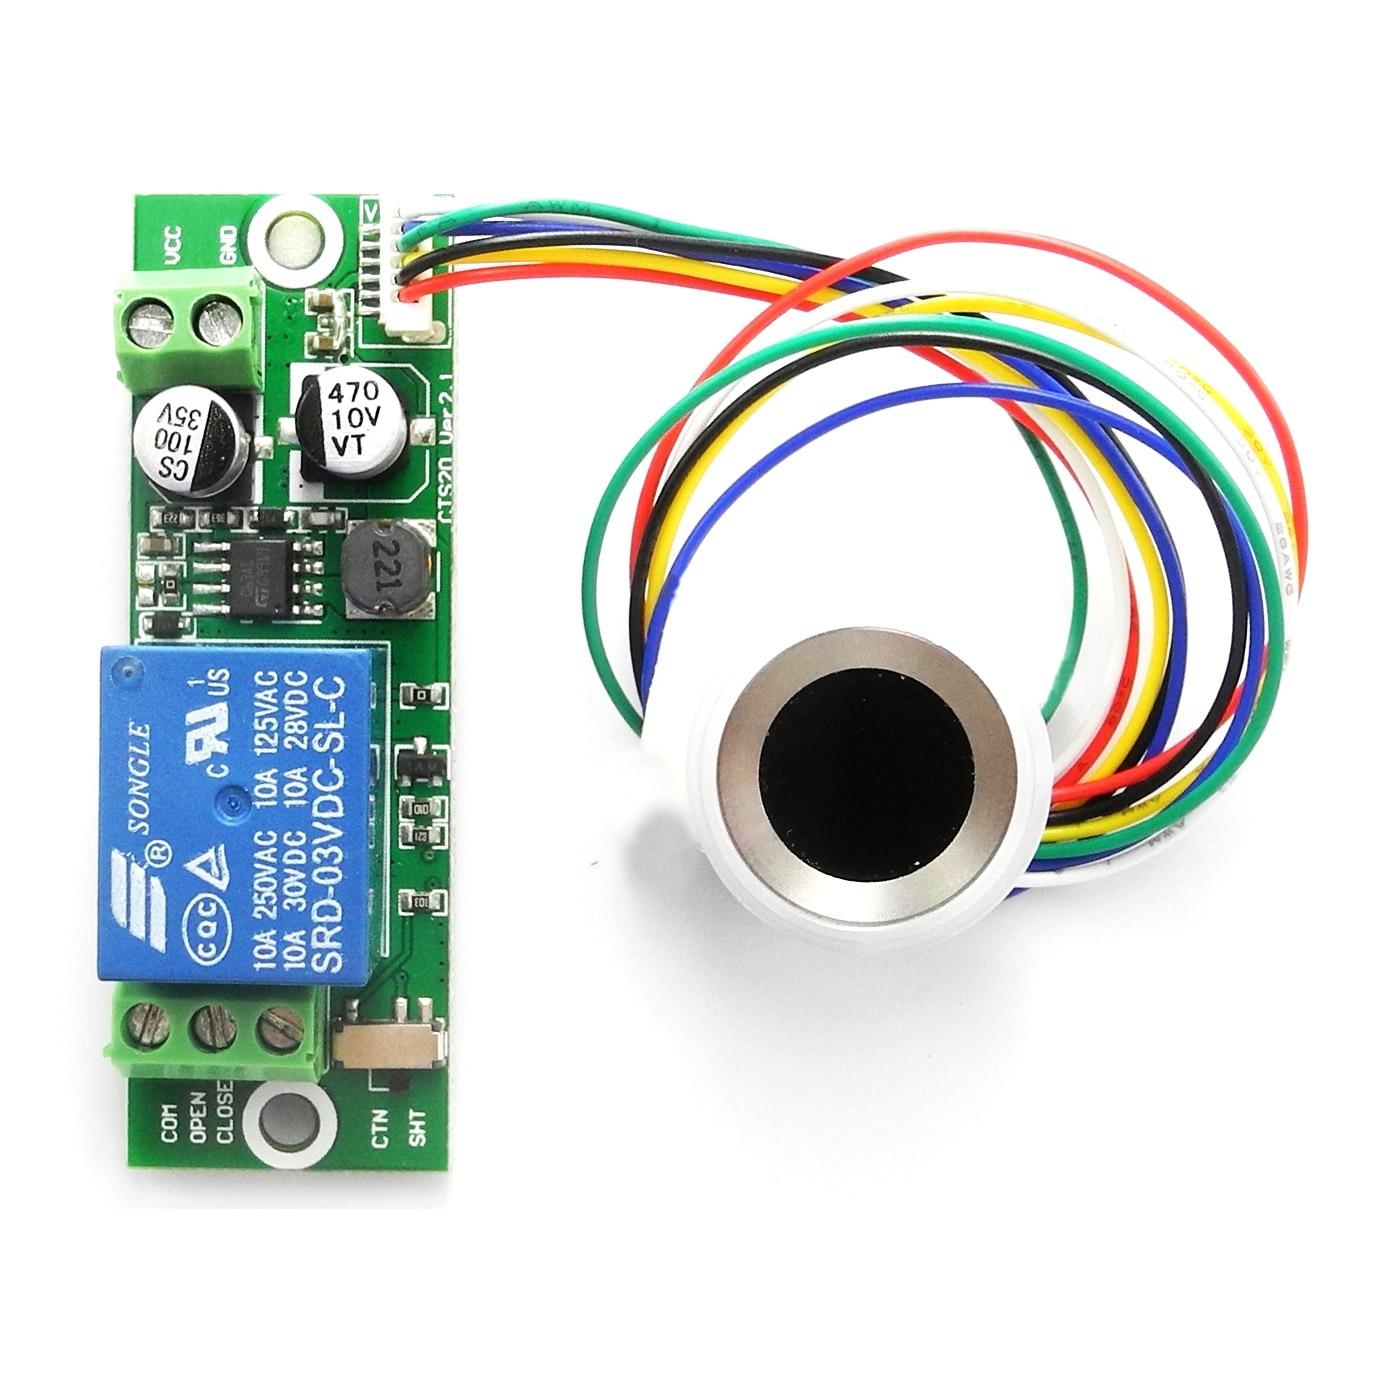 DIY BIO Fingerprint Identification Module Fingerprint Authentication Control Relay Module for Access